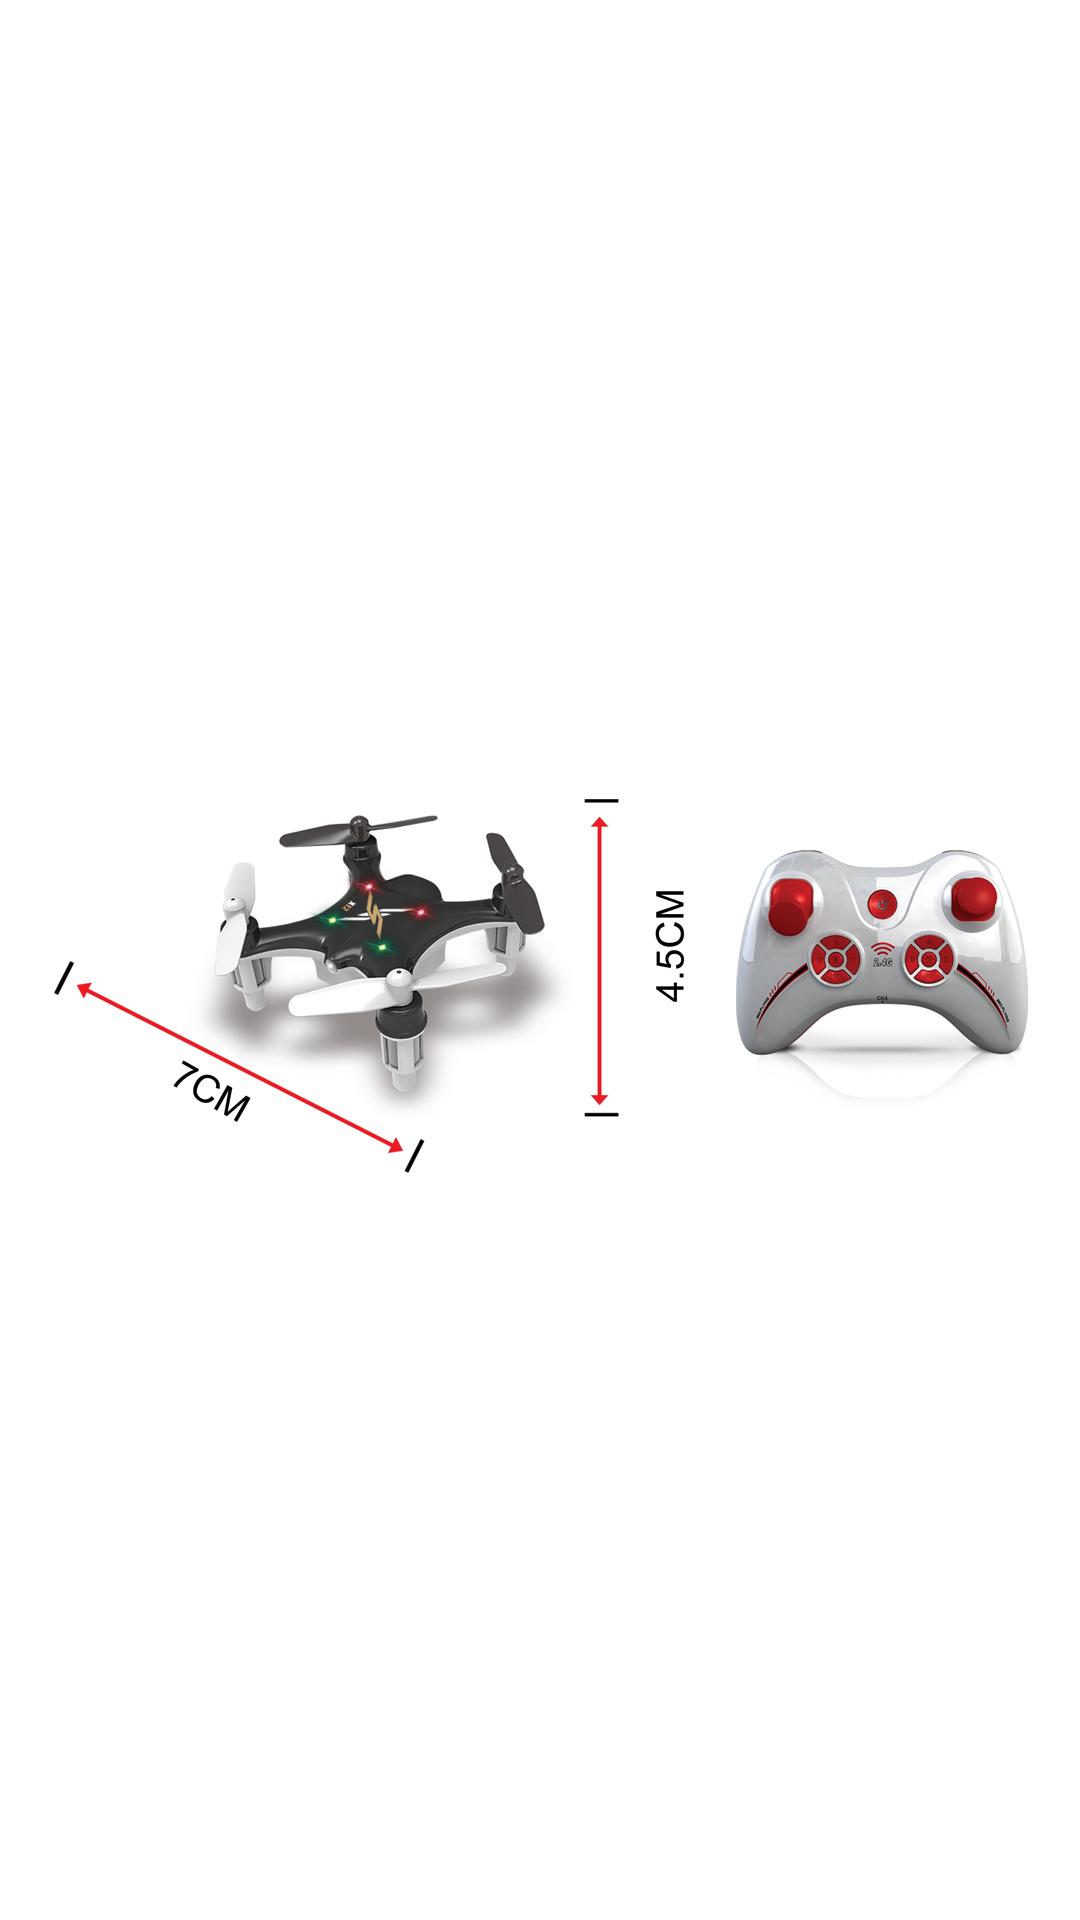 Buy Toyhouse Smallest Drone X12nano Palm 4ch Gyro 6 Axis